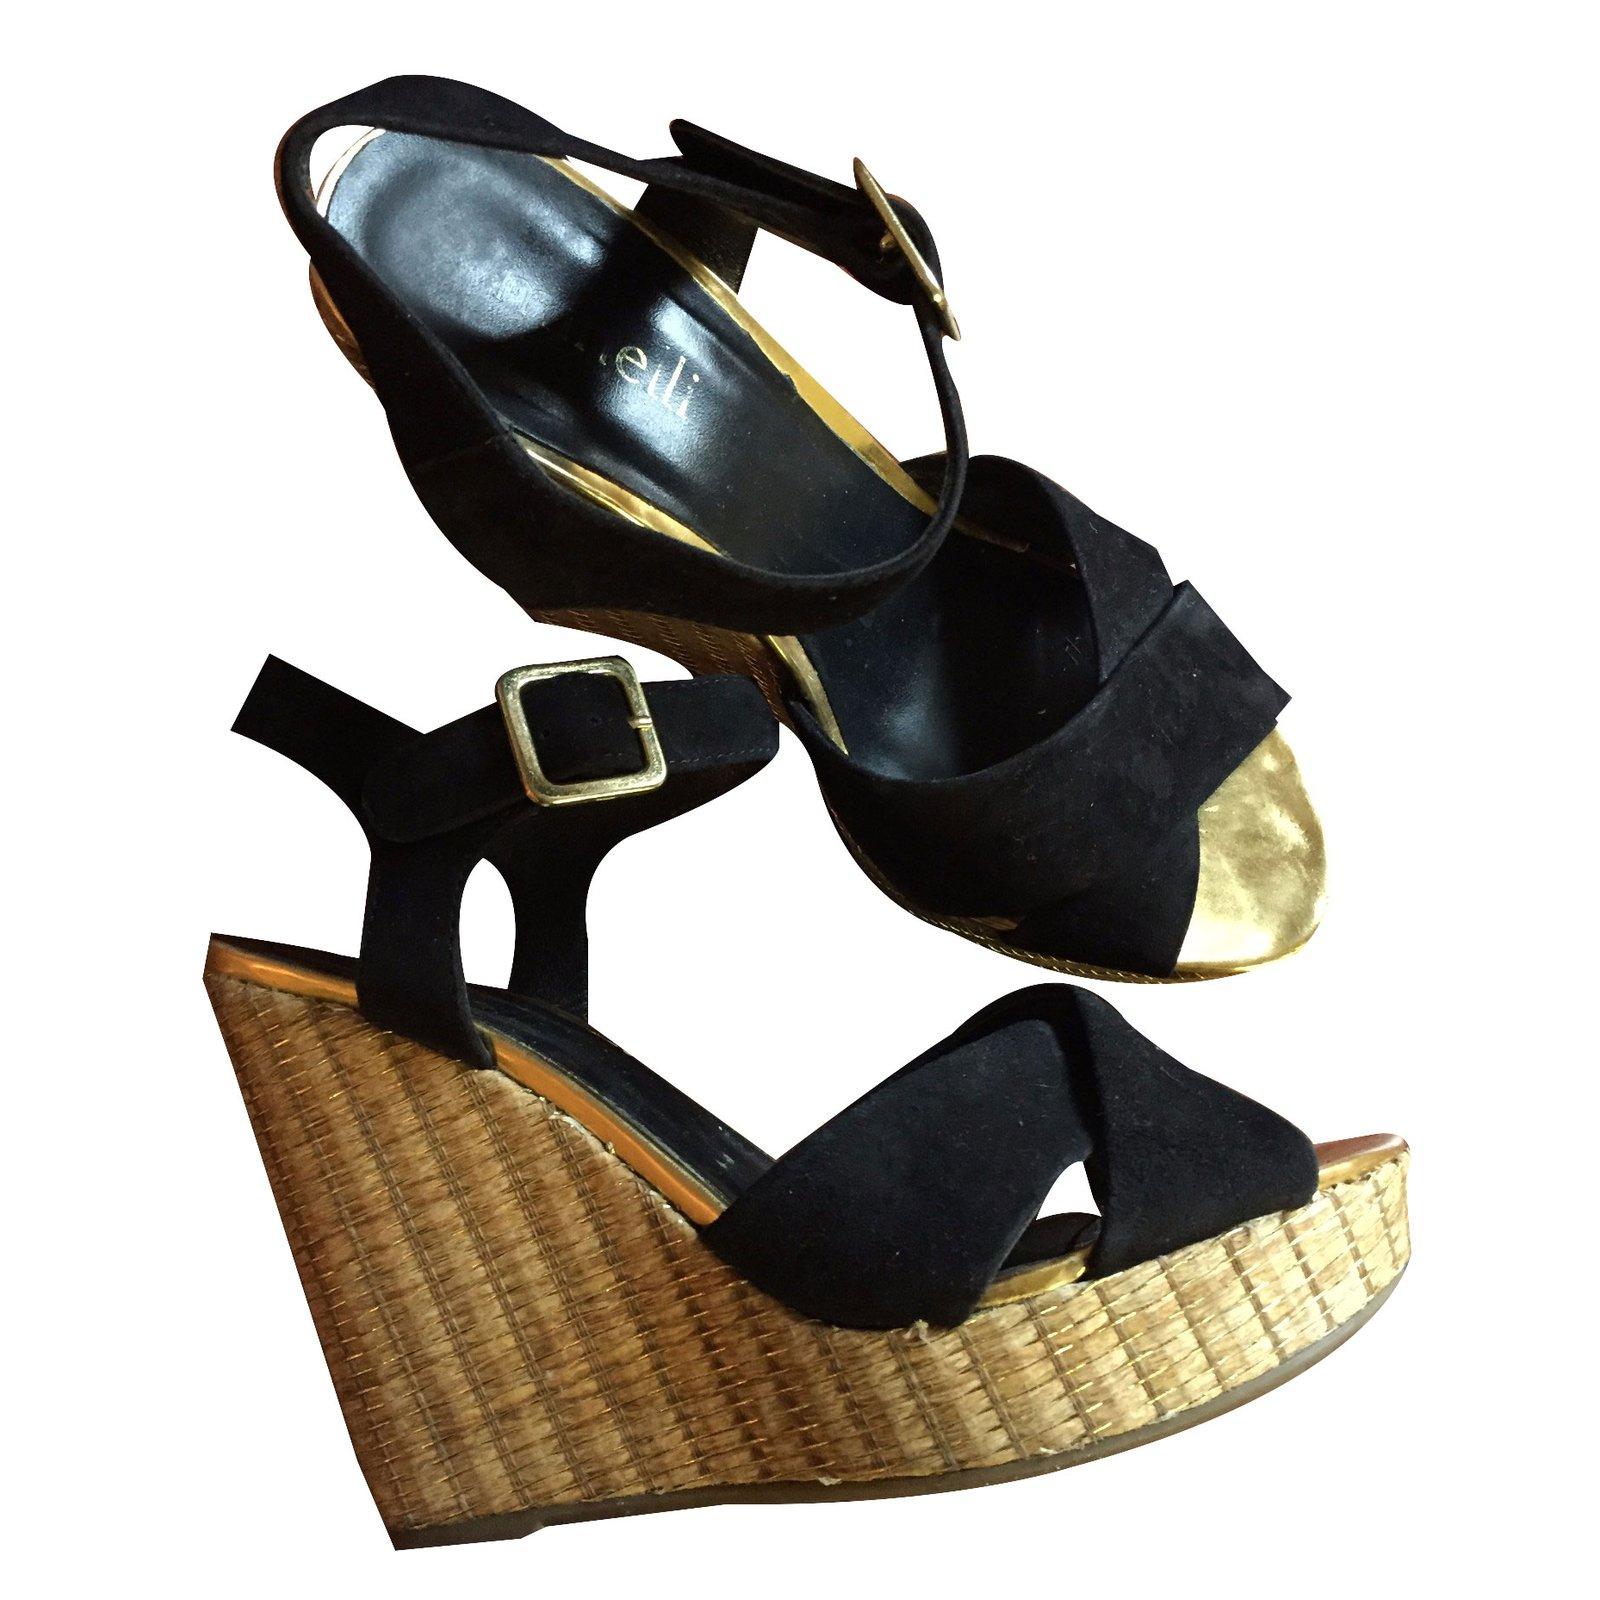 51ad11513242 Autre Marque  Minelli  Sandals Sandals Deerskin Black ref.25548 - Joli  Closet